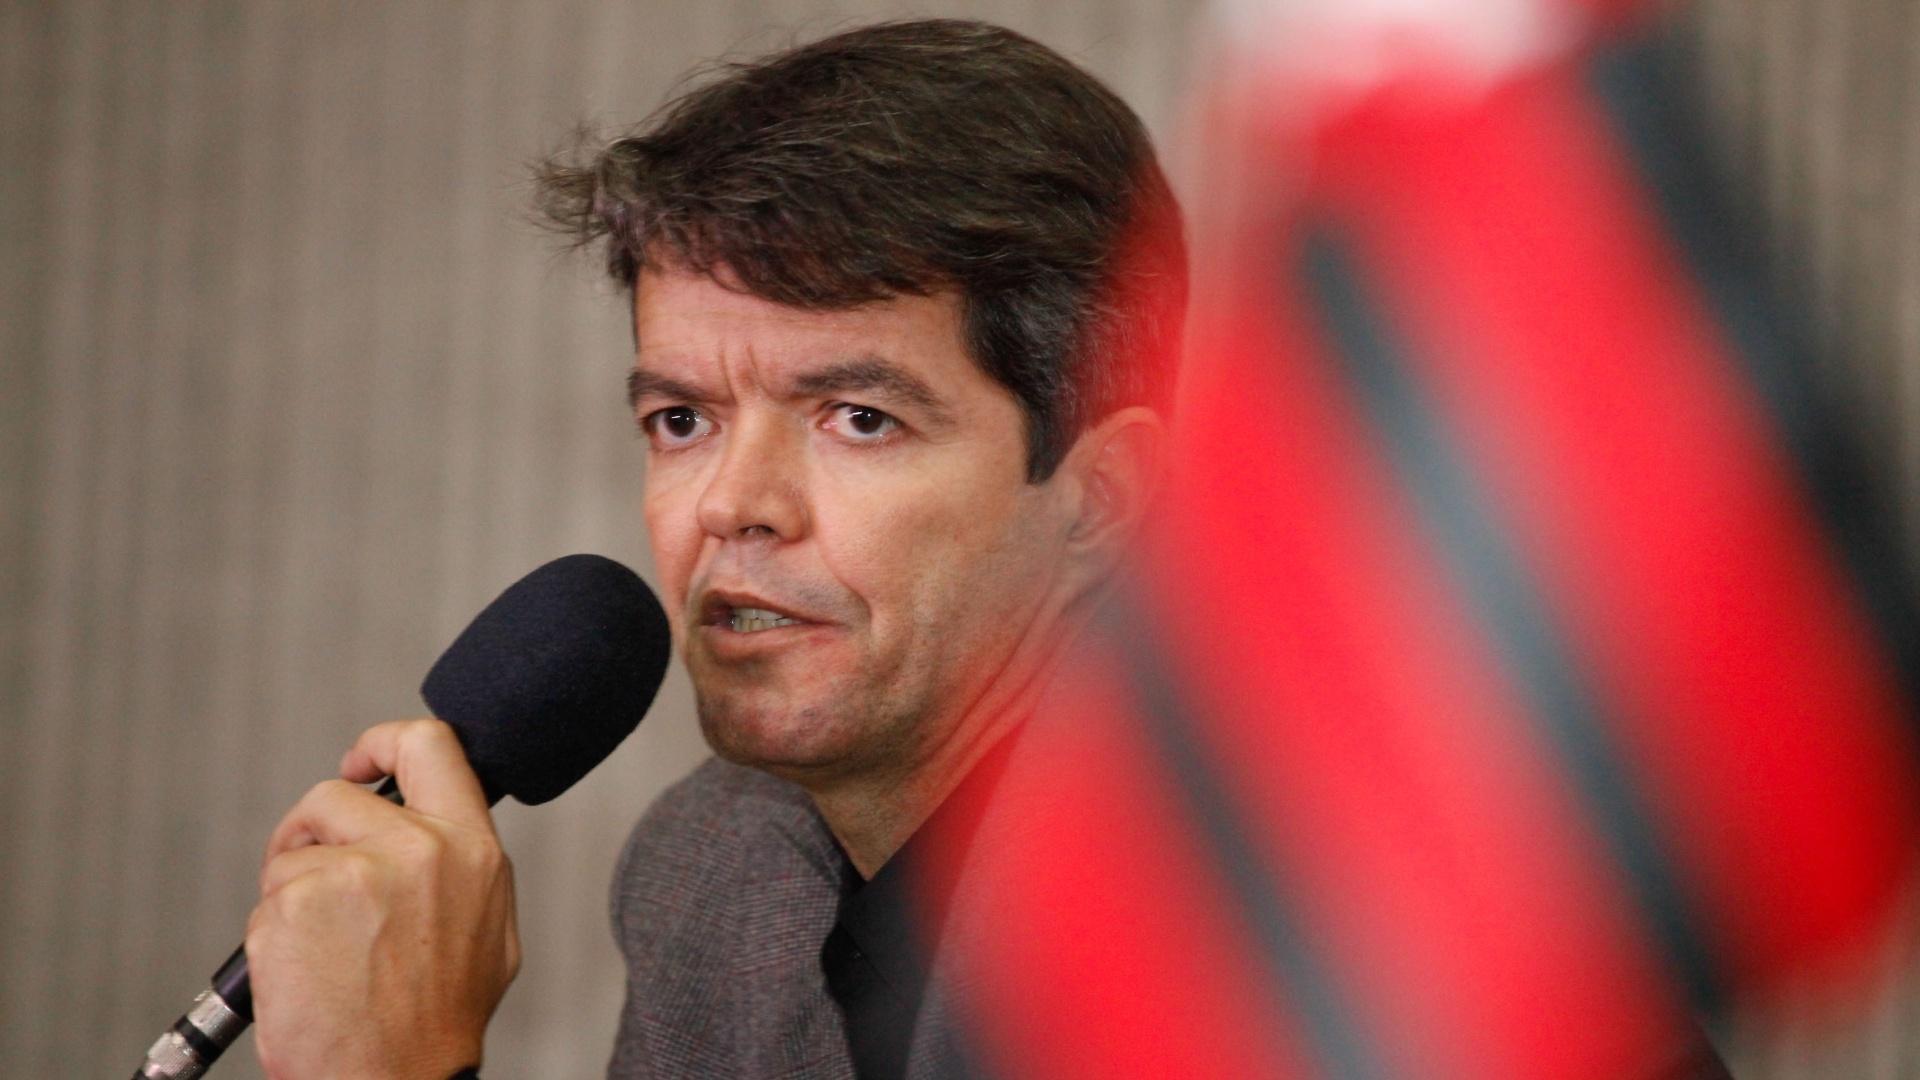 EXCLUSIVO: Segundo Marcos Braz, Ximenes n�o deve ficar no Fla.